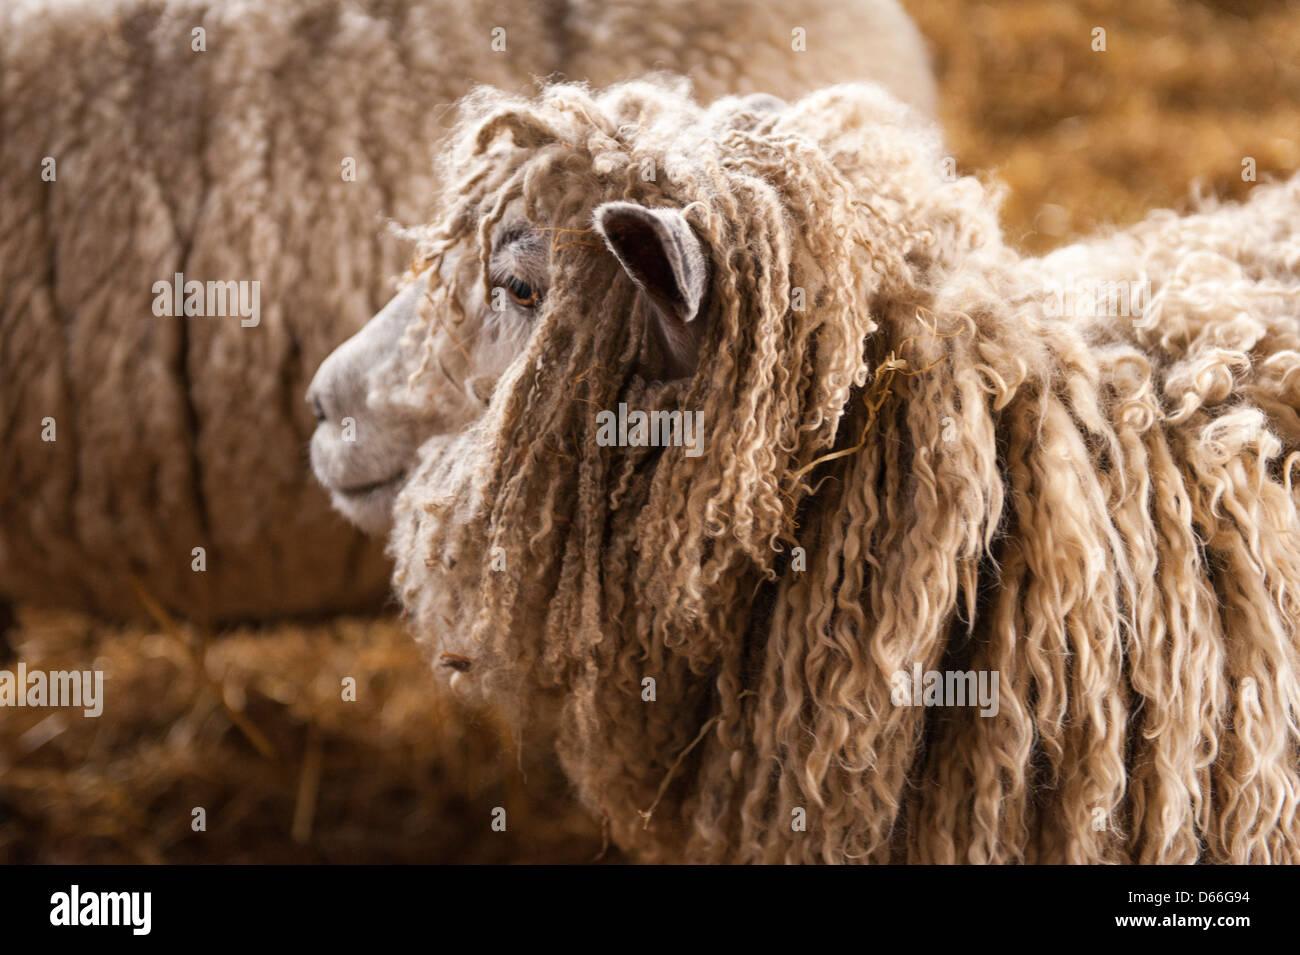 Vowley Farm Royal Wootton Bassett Wilts ewe sheep labour labor maternity pen barn rare Cotswold Cots Cotes Lion - Stock Image